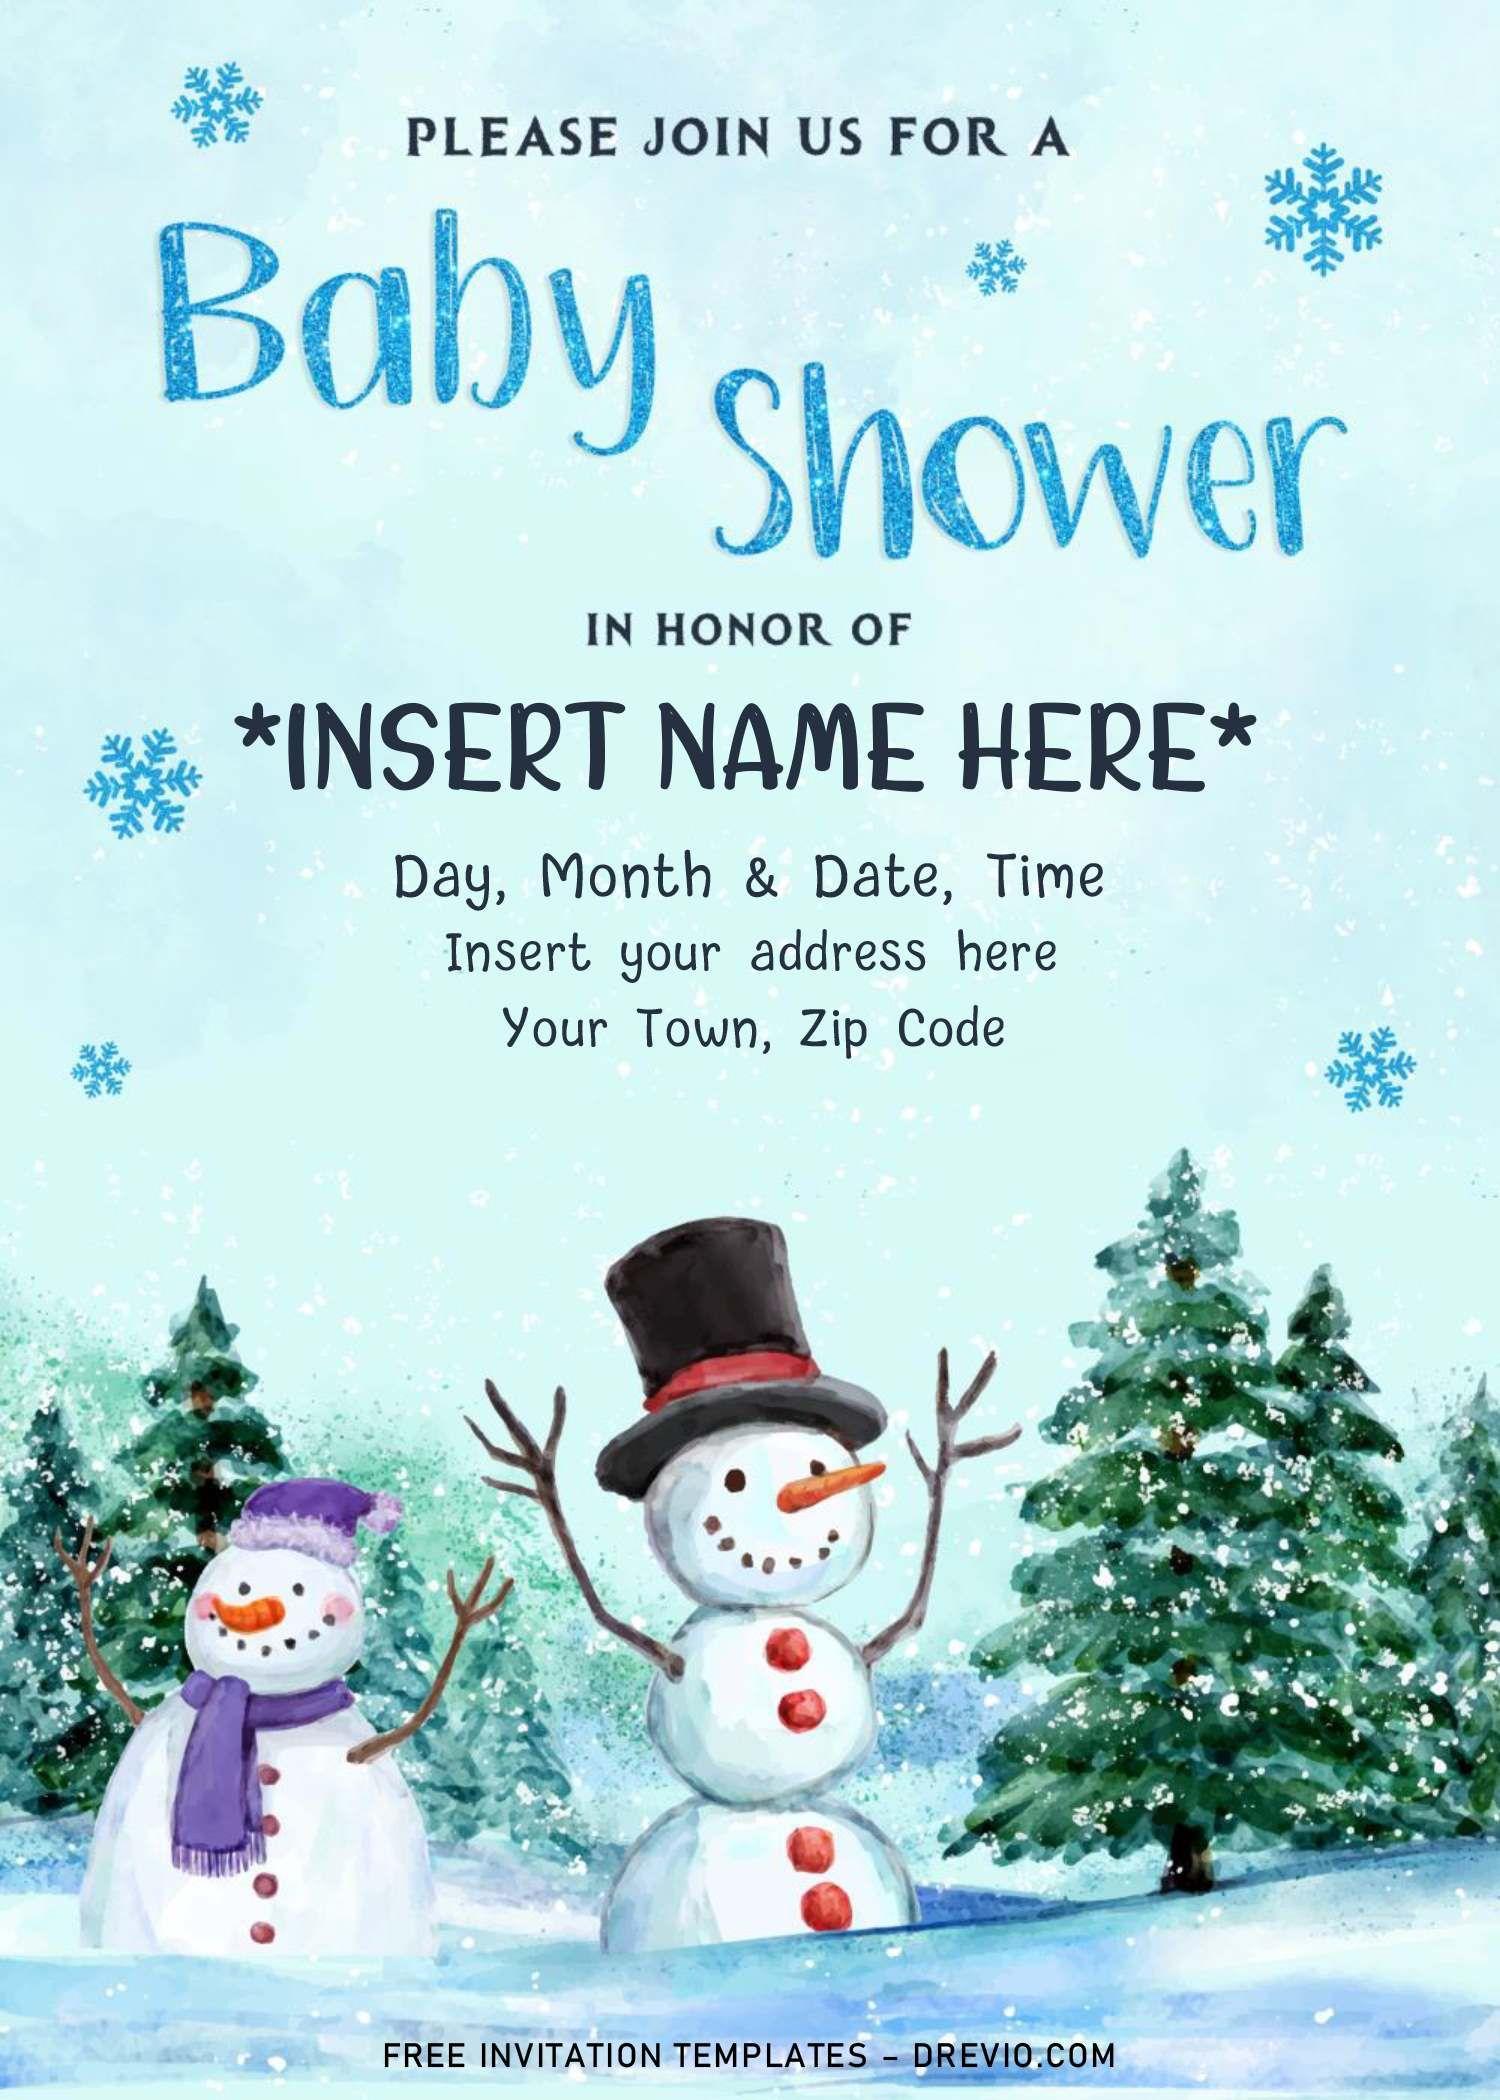 Free Winter Baby Shower Invitation Templates For Word Winter Baby Shower Invitations Baby Shower Winter Free Printable Birthday Invitations